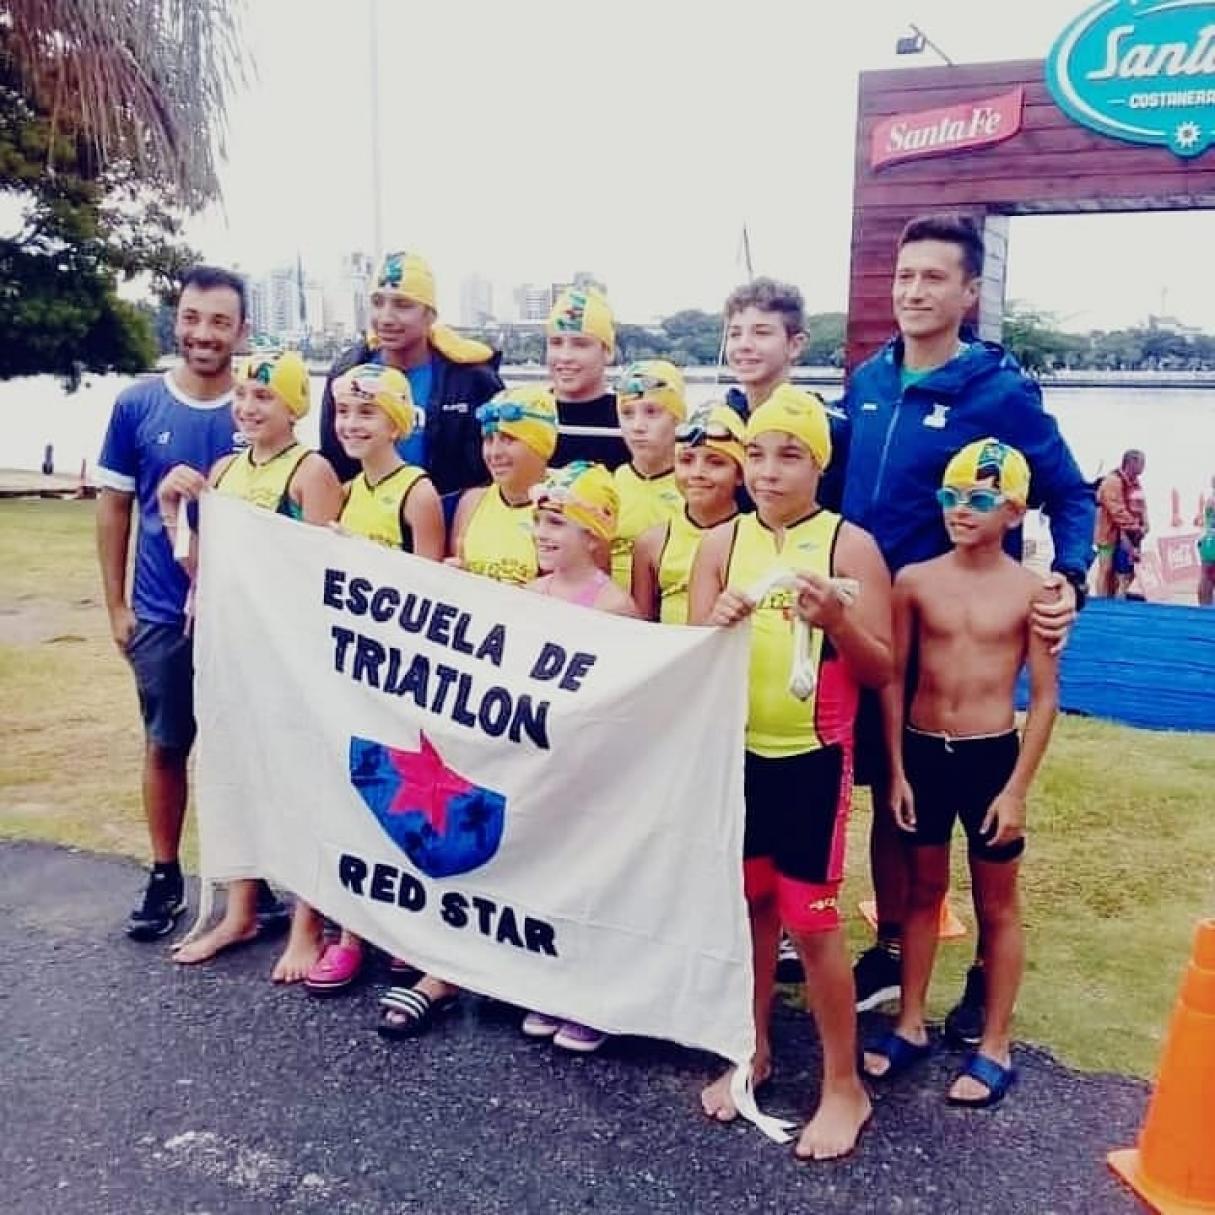 Se viene el primer mini triathlon del año en San Lorenzo